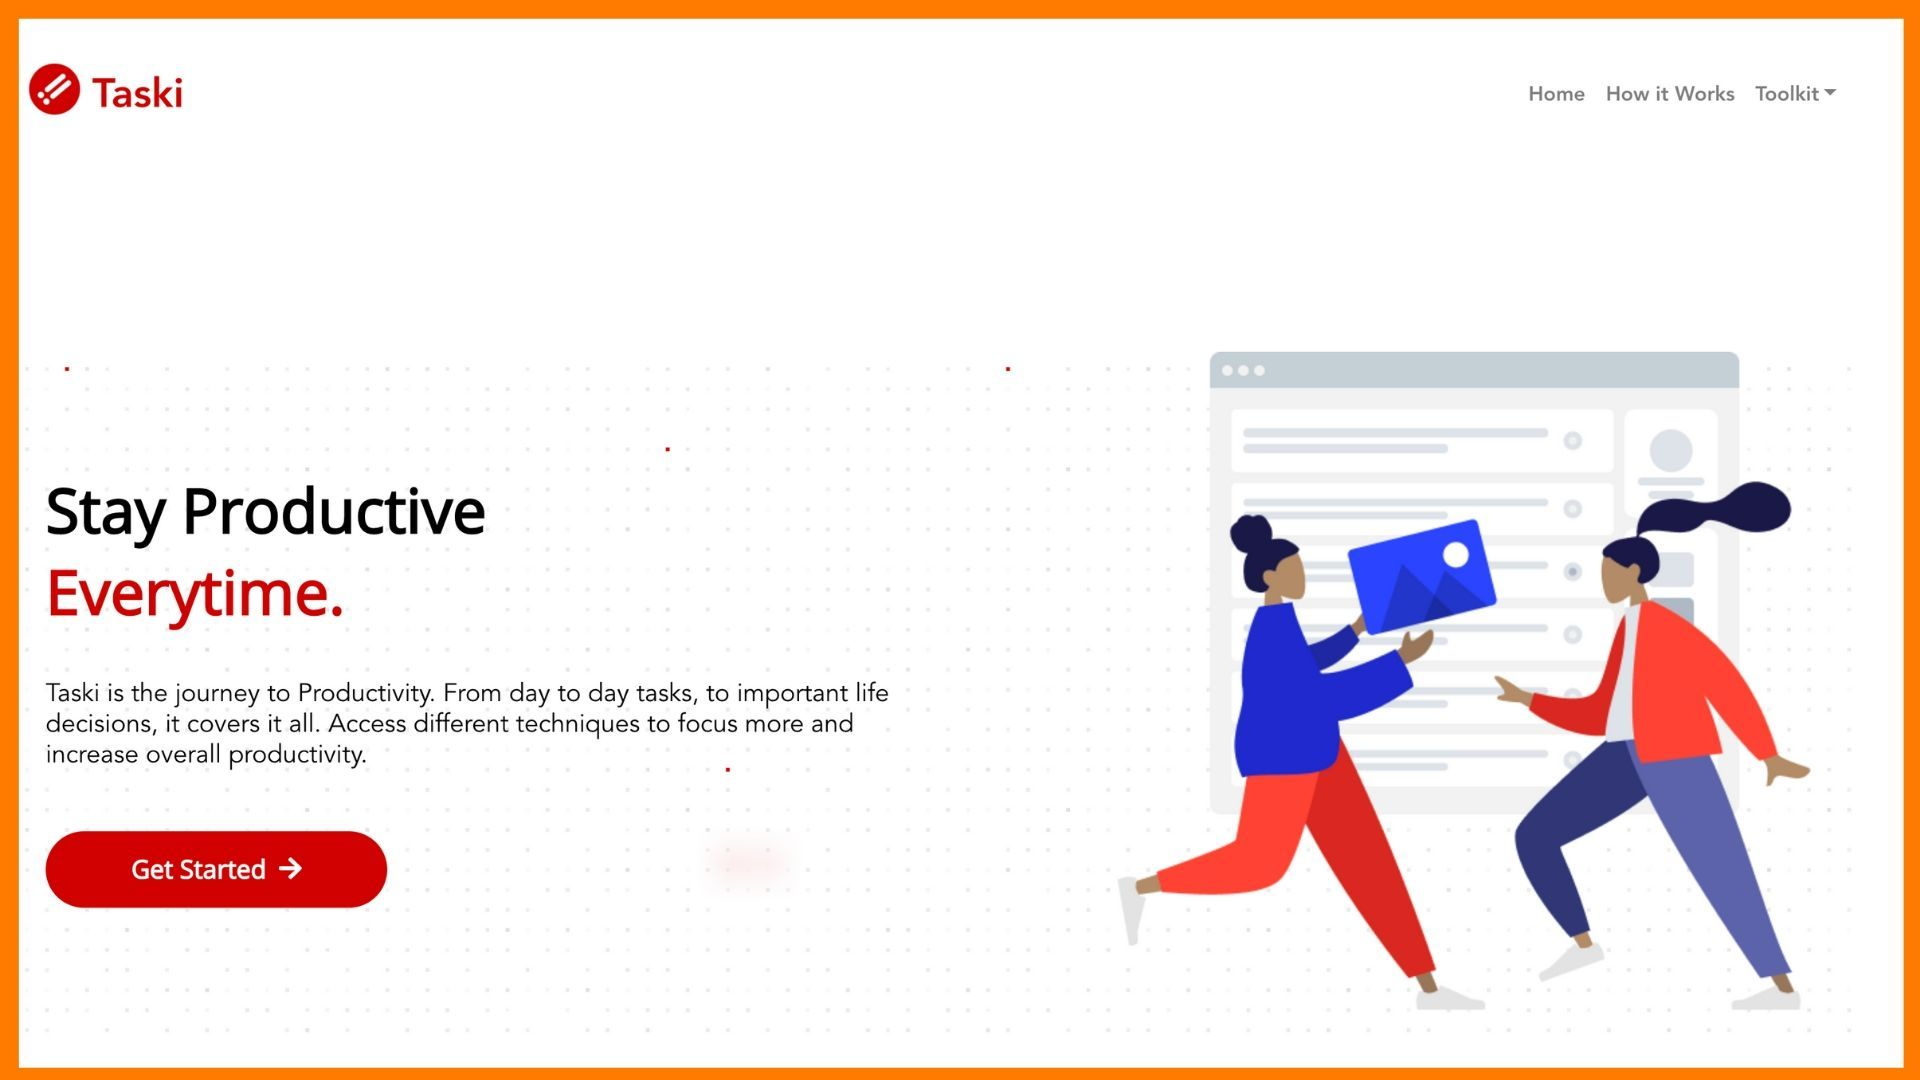 Taski website snapshot